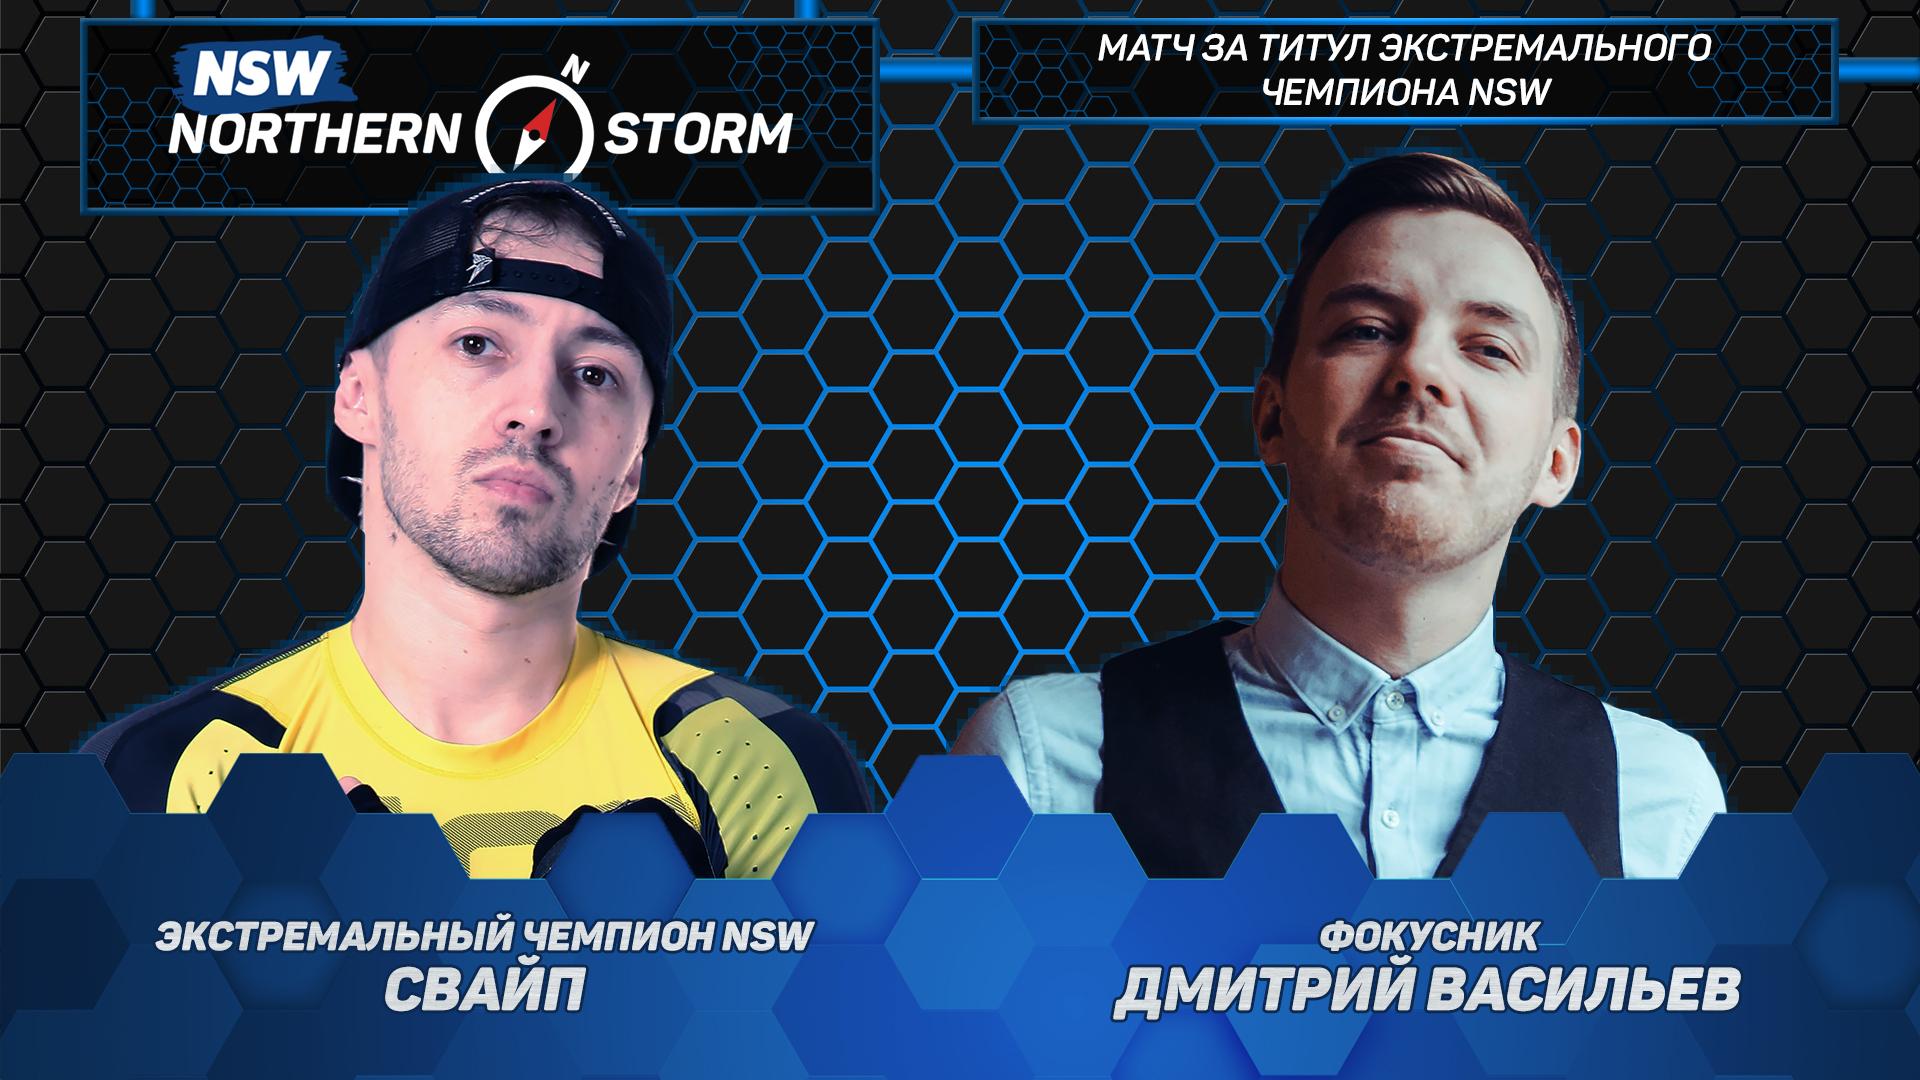 NSW Northern Storm (18/03): Свайп против 'Фокусника' Дмитрия Васильева